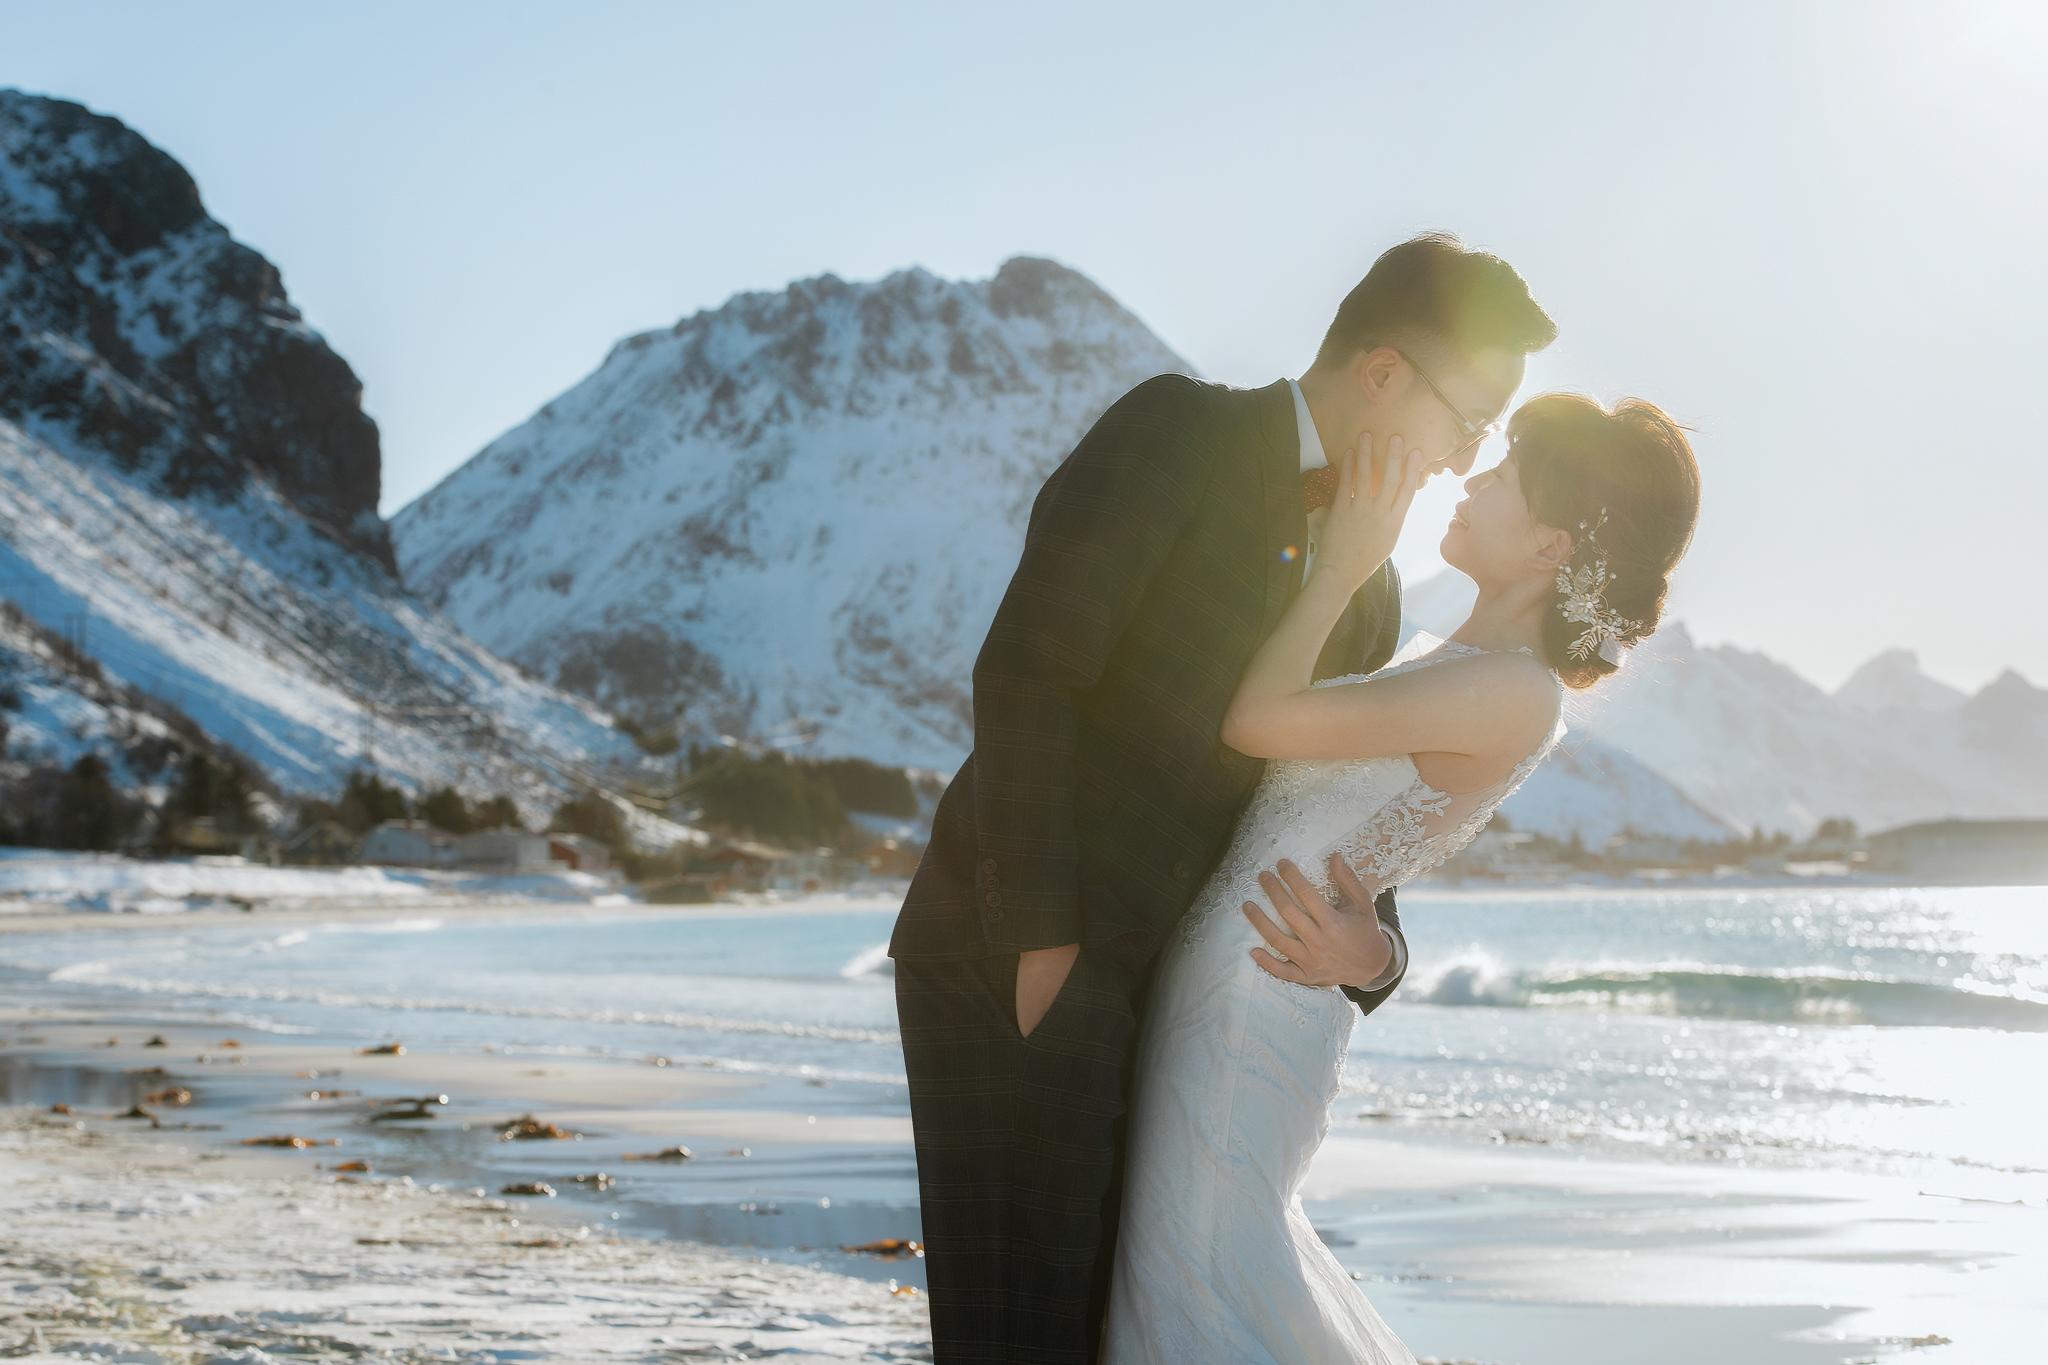 東法, 藝術婚紗, Donfer, Donfer Photography, EASTERN WEDDING, 海外婚紗, 挪威婚紗, Norway Pre-Wedding, Lofoten, Tromso